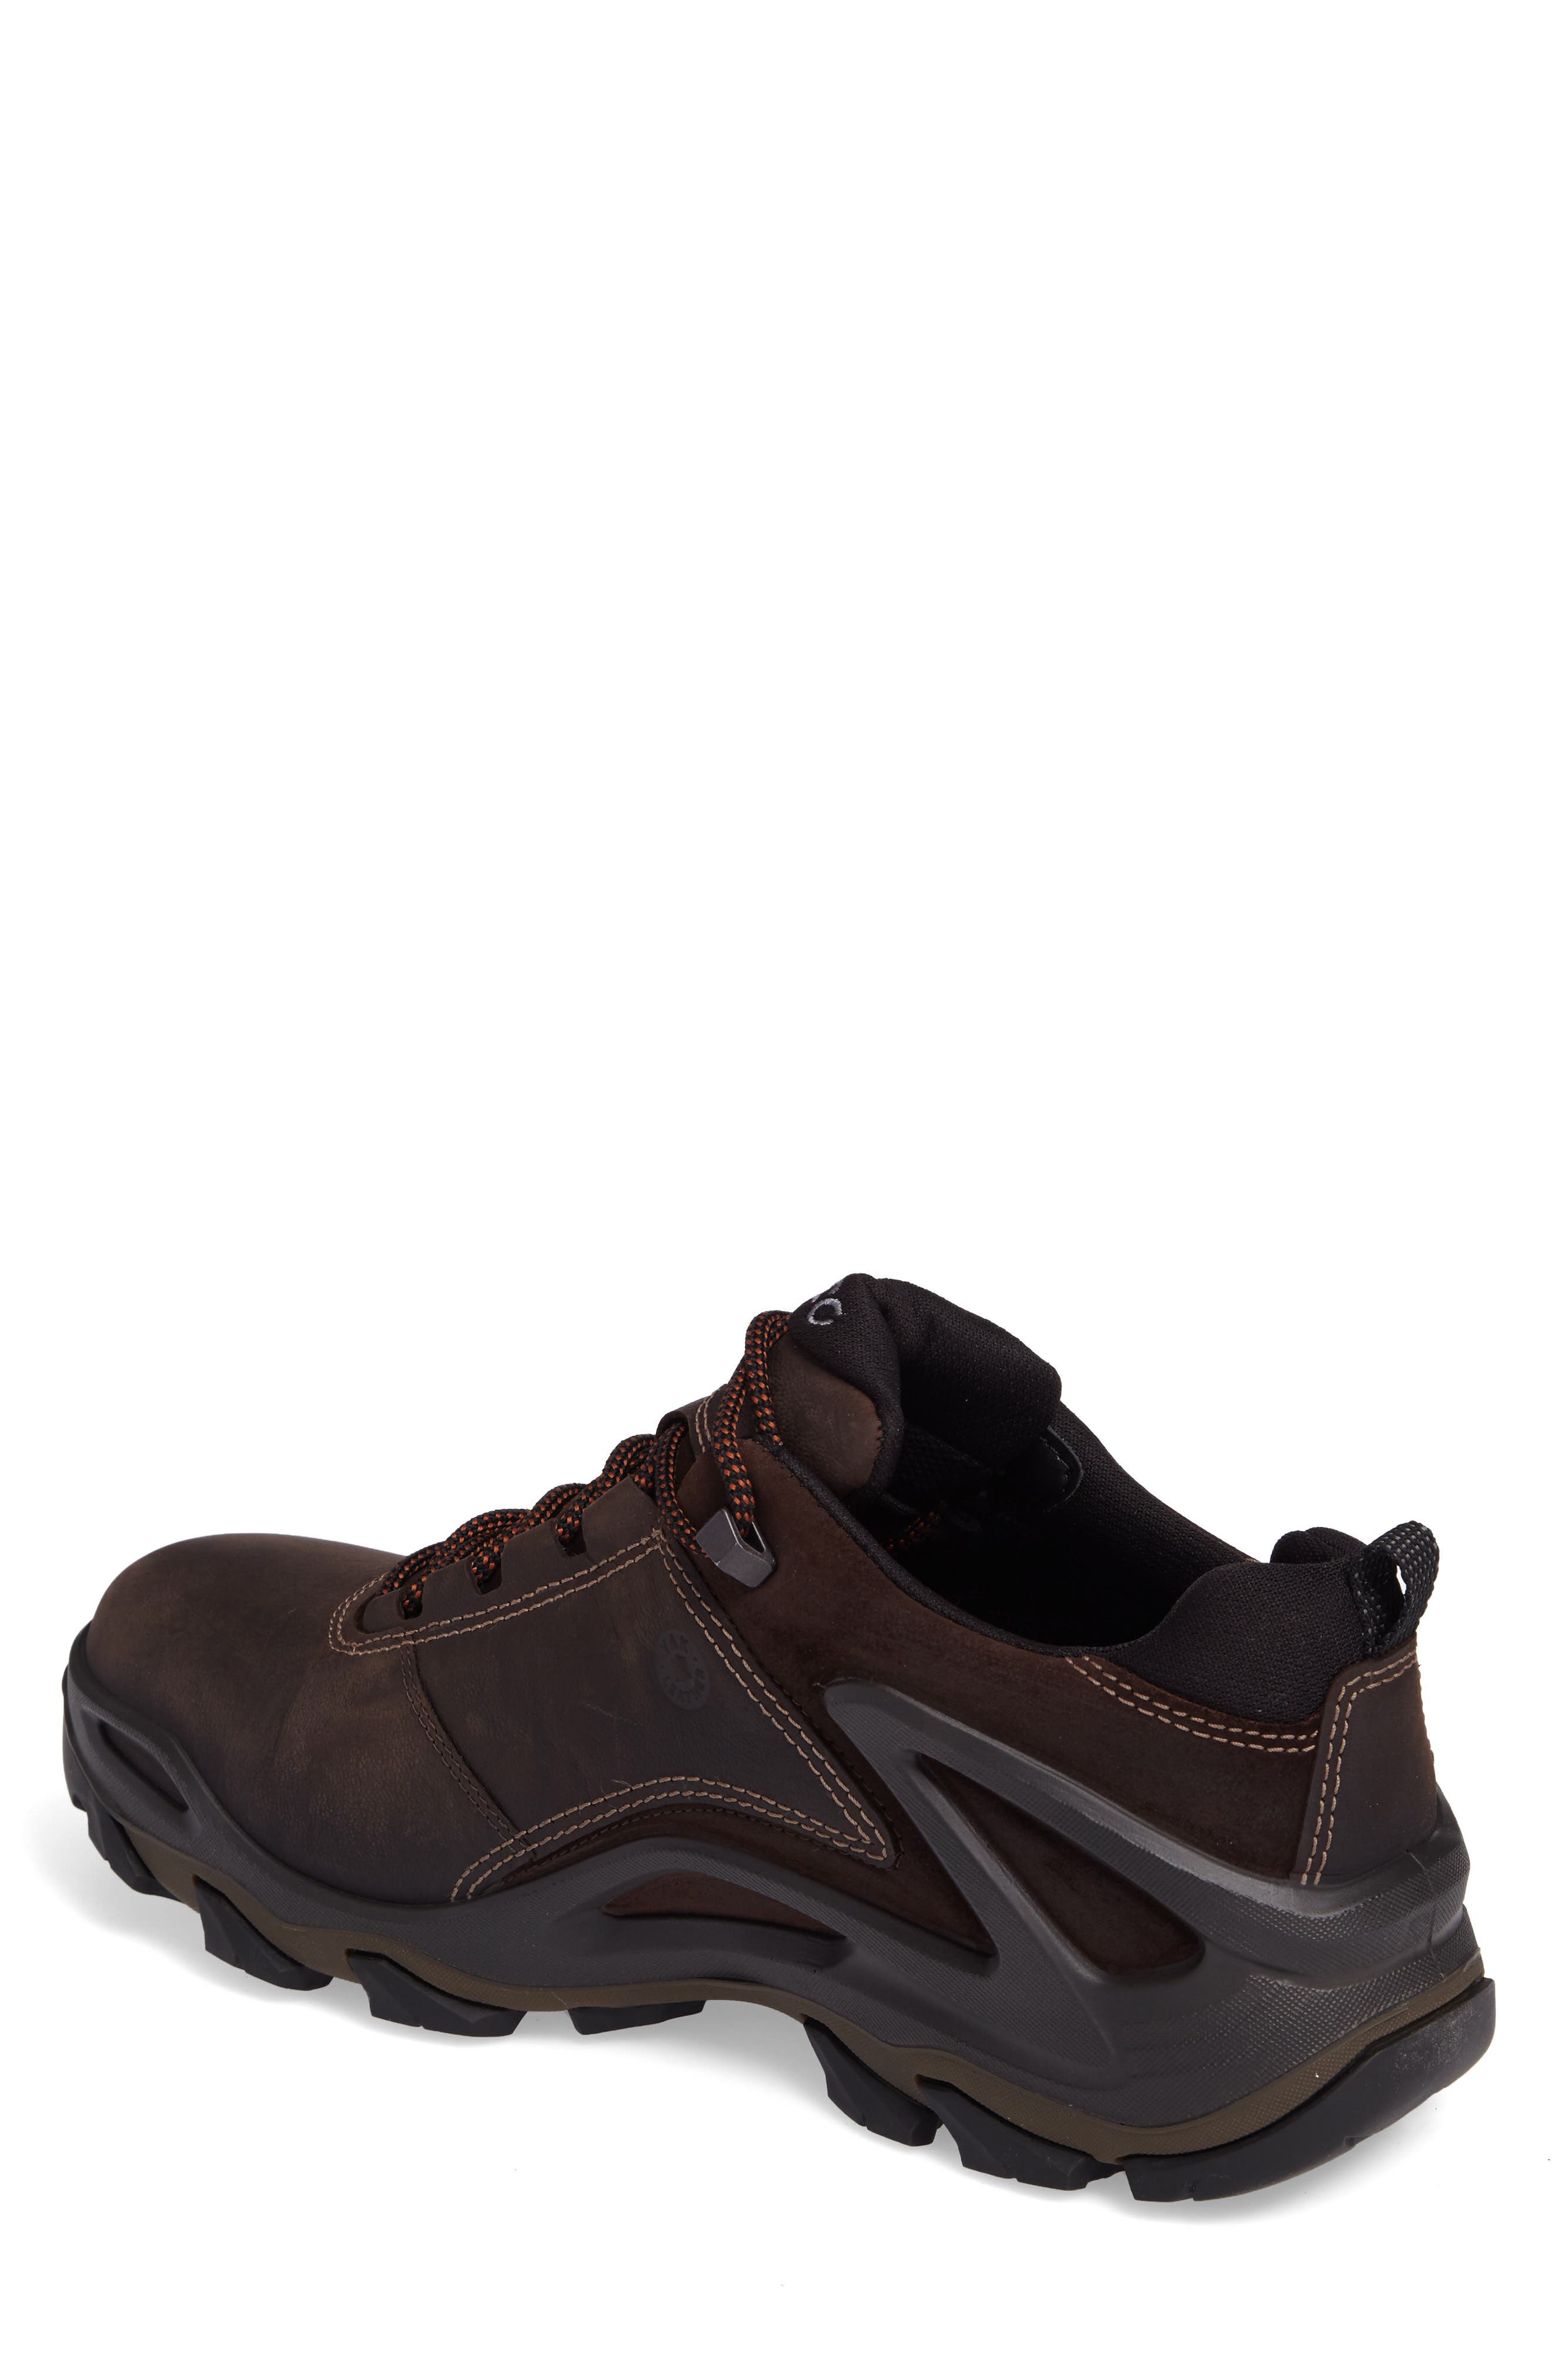 Terra Evo GTX Low Hiking Shoe,                             Alternate thumbnail 2, color,                             Coffee/ Mocha Nubuck